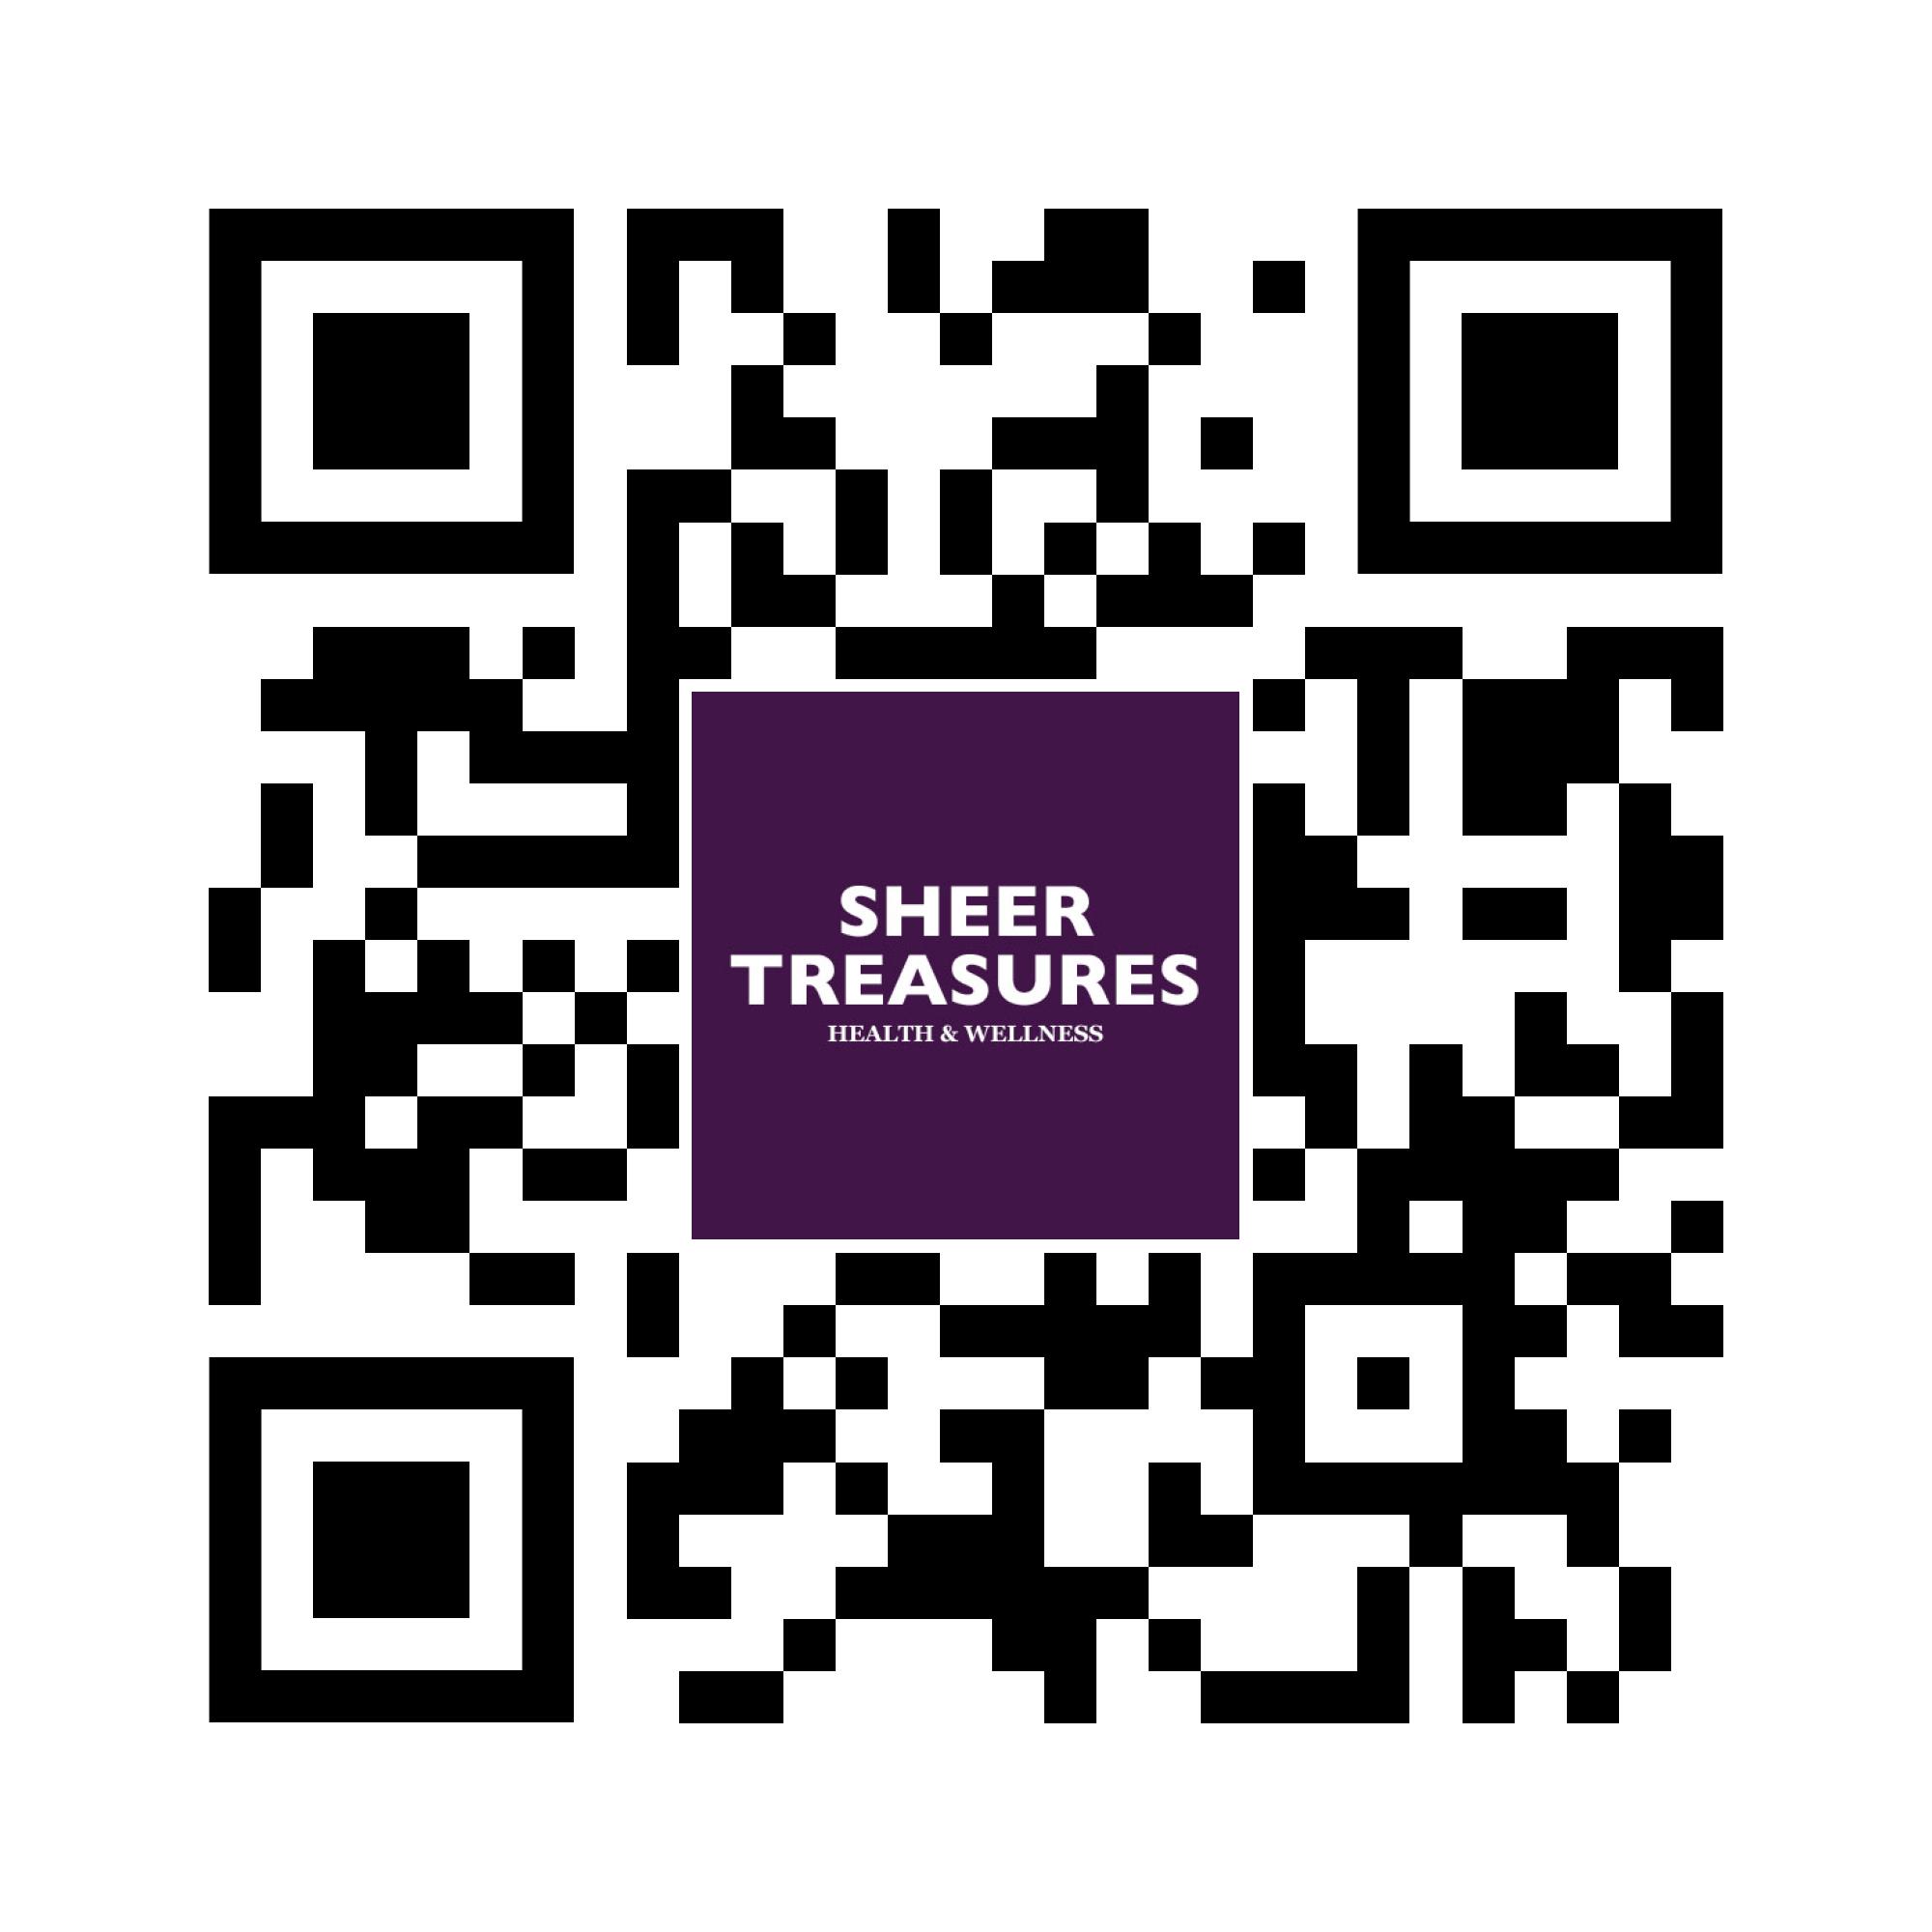 Sheer Treasures Co. - Ridgedale Center, Minnetonka, MN. 55305 image 22